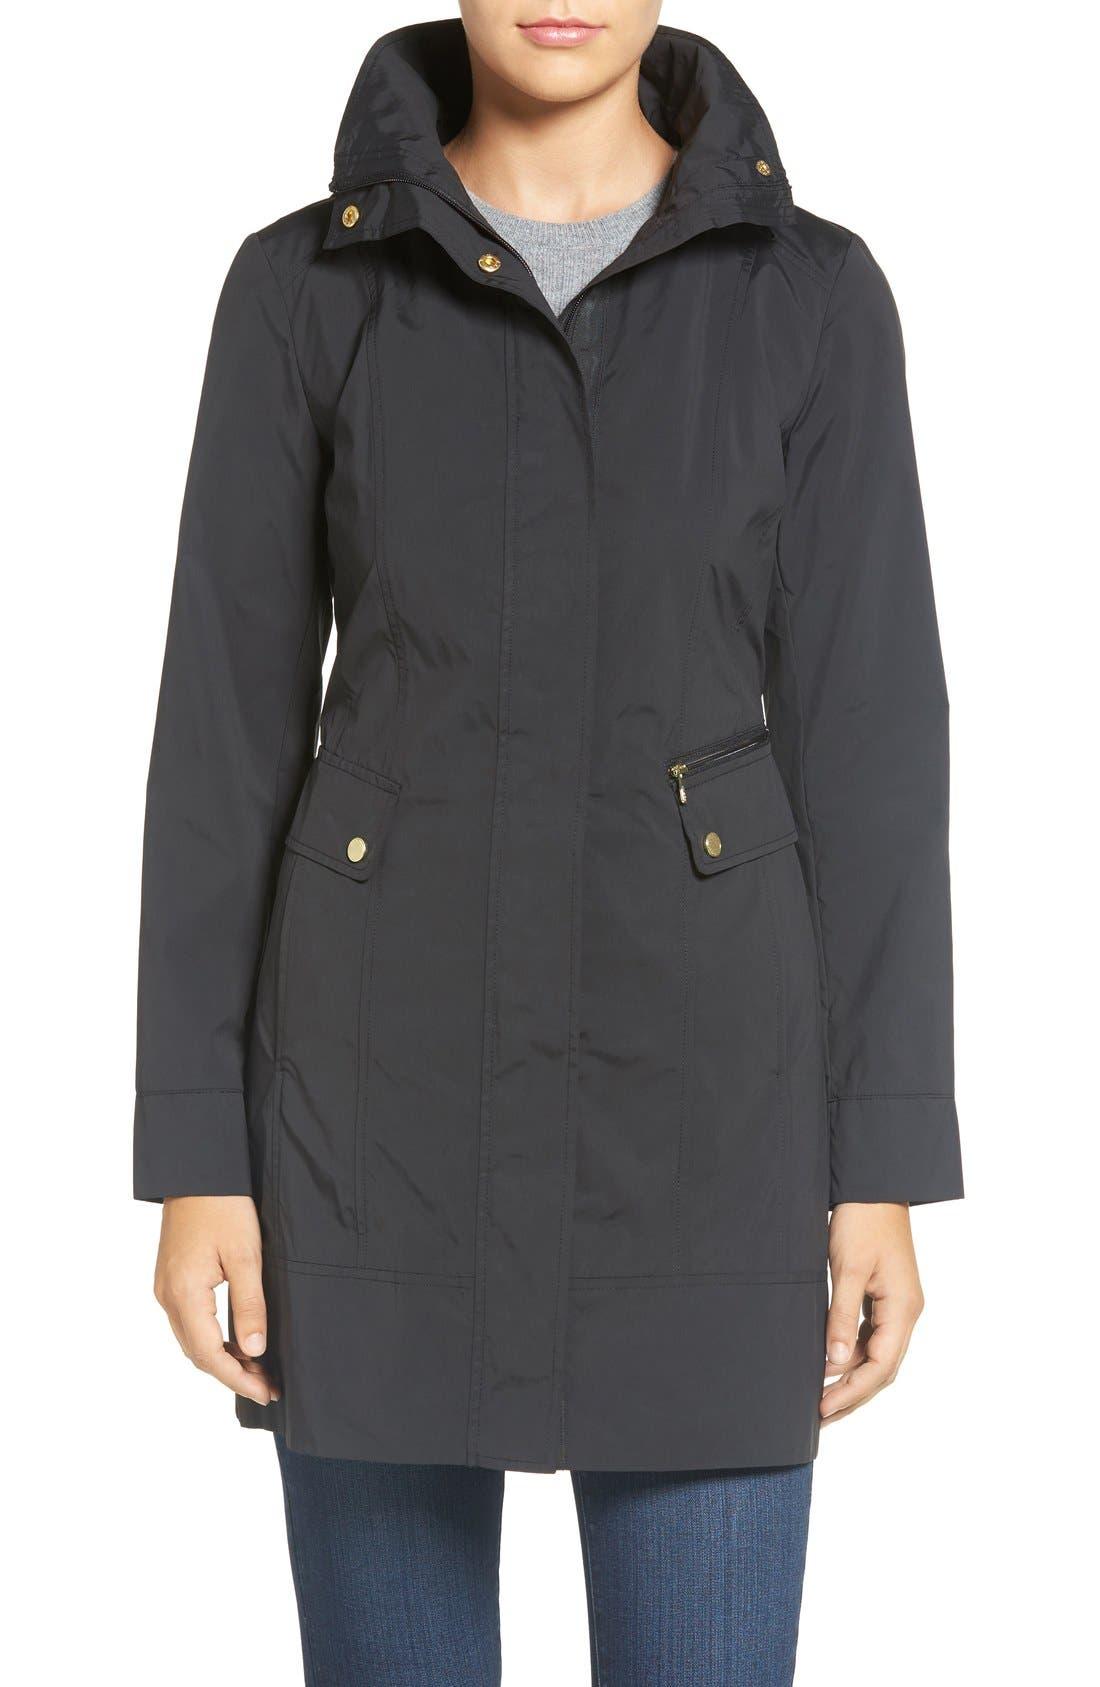 COLE HAAN SIGNATURE, Back Bow Packable Hooded Raincoat, Main thumbnail 1, color, BLACK